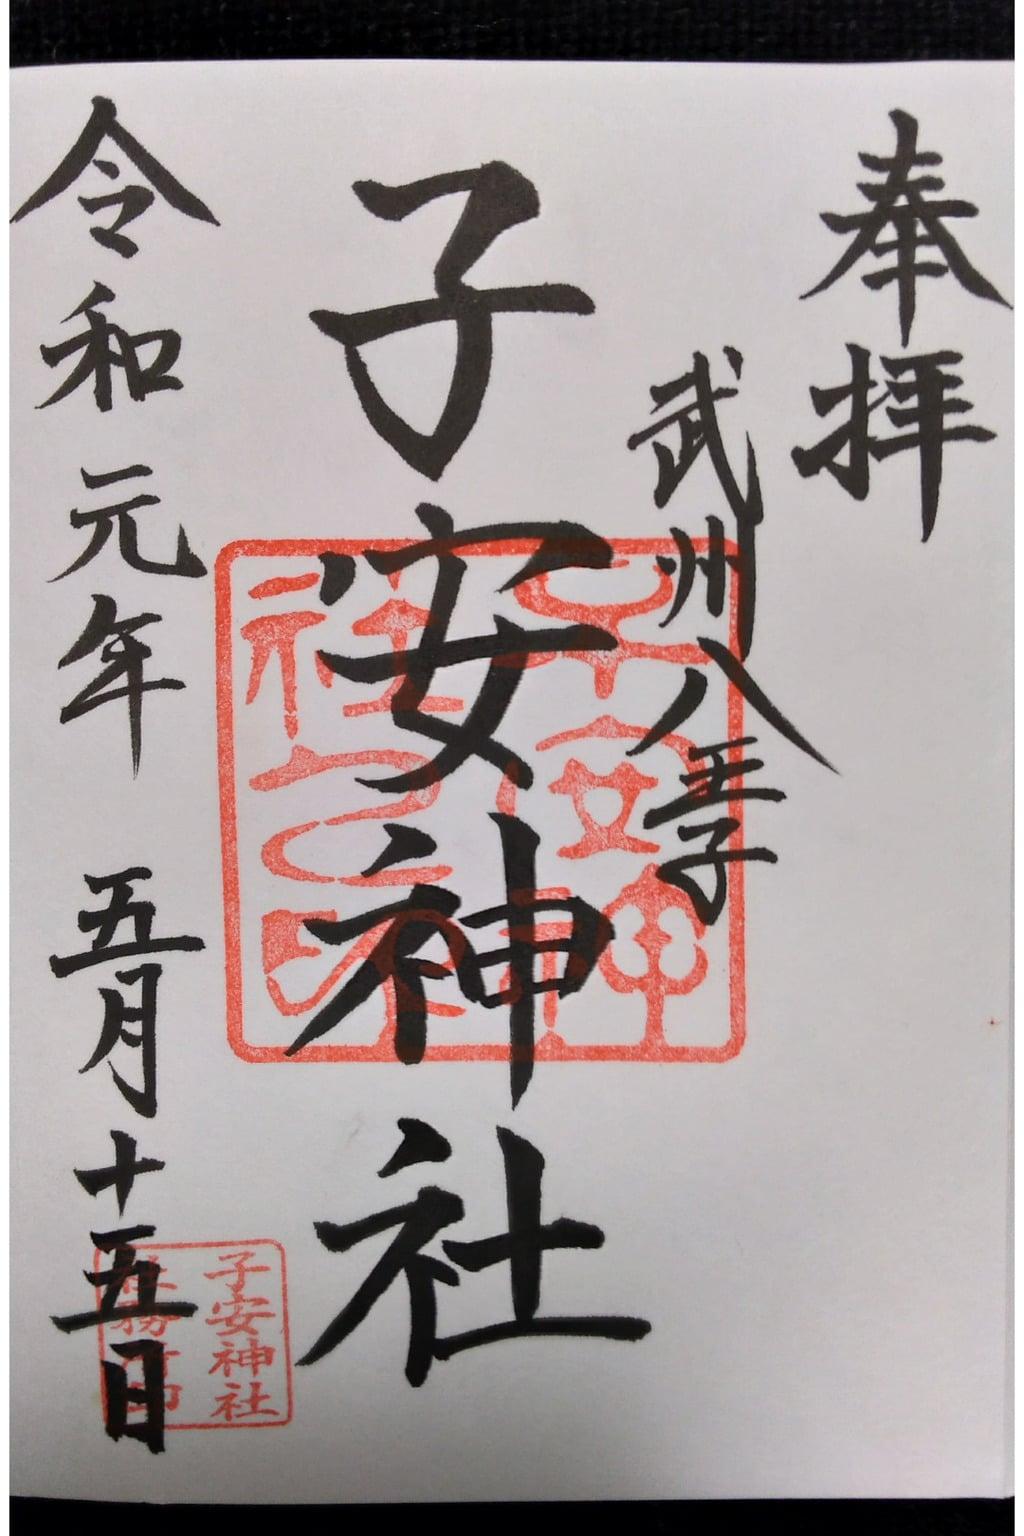 子安神社の御朱印